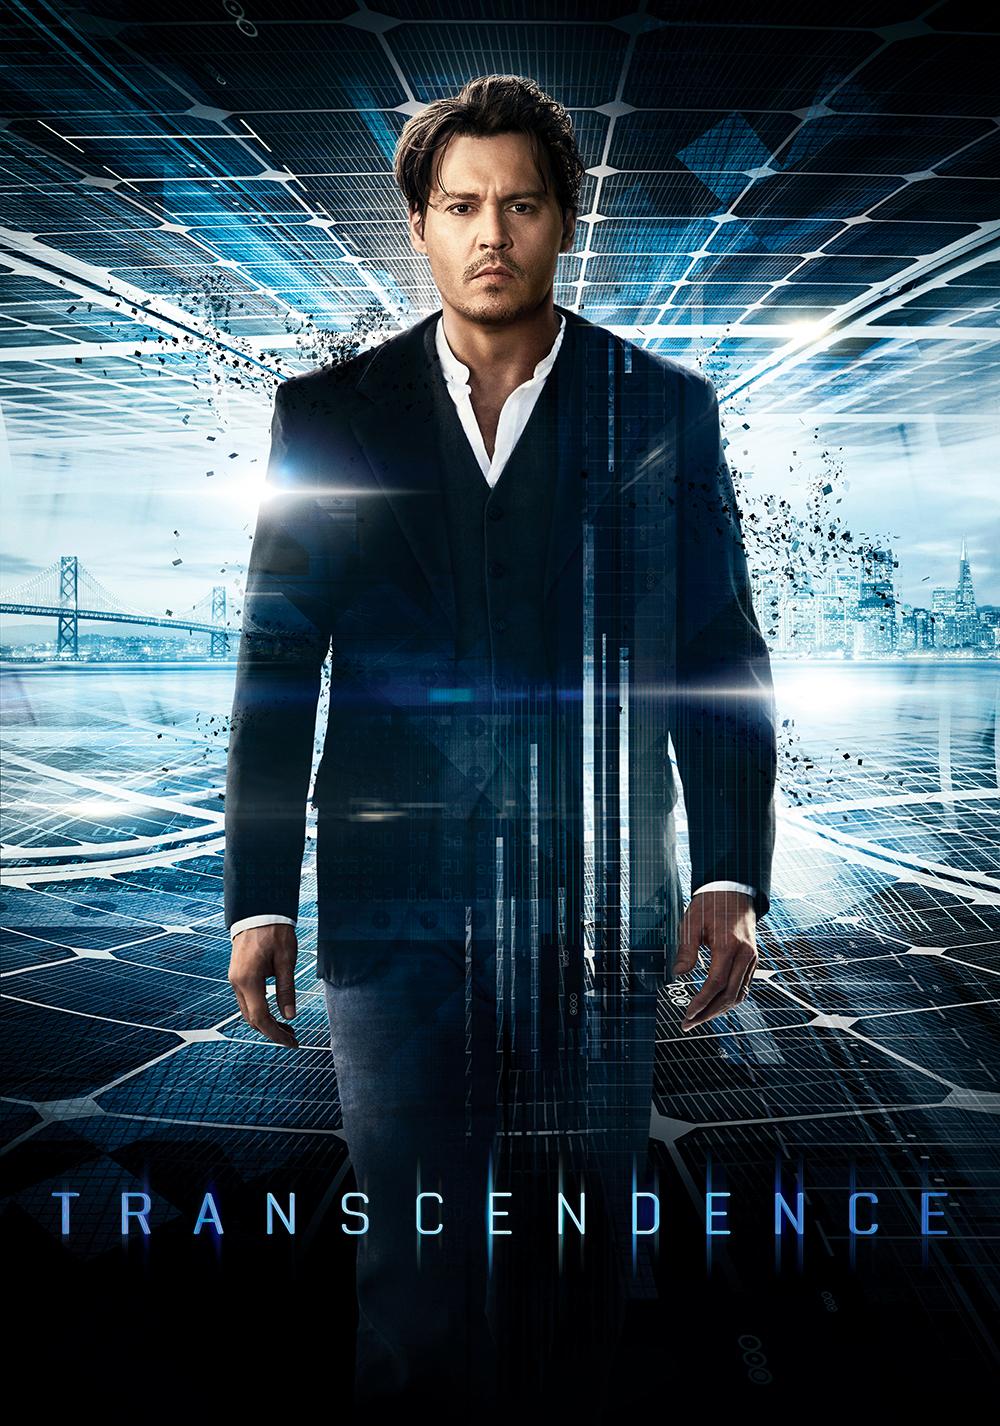 Transcendence Film